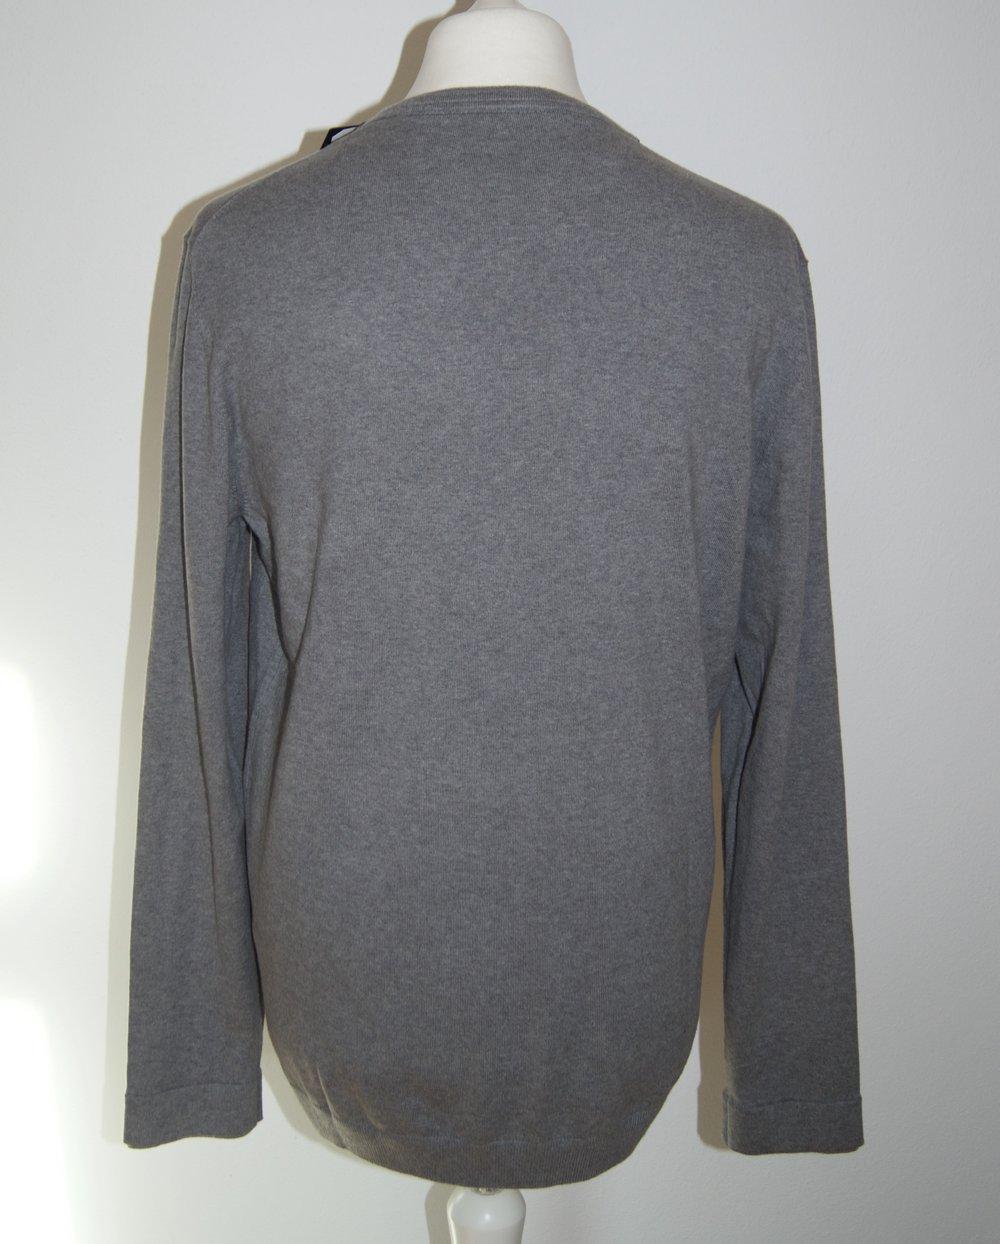 tom tailor pullover neu mit etikett gr xxl herren pulli. Black Bedroom Furniture Sets. Home Design Ideas